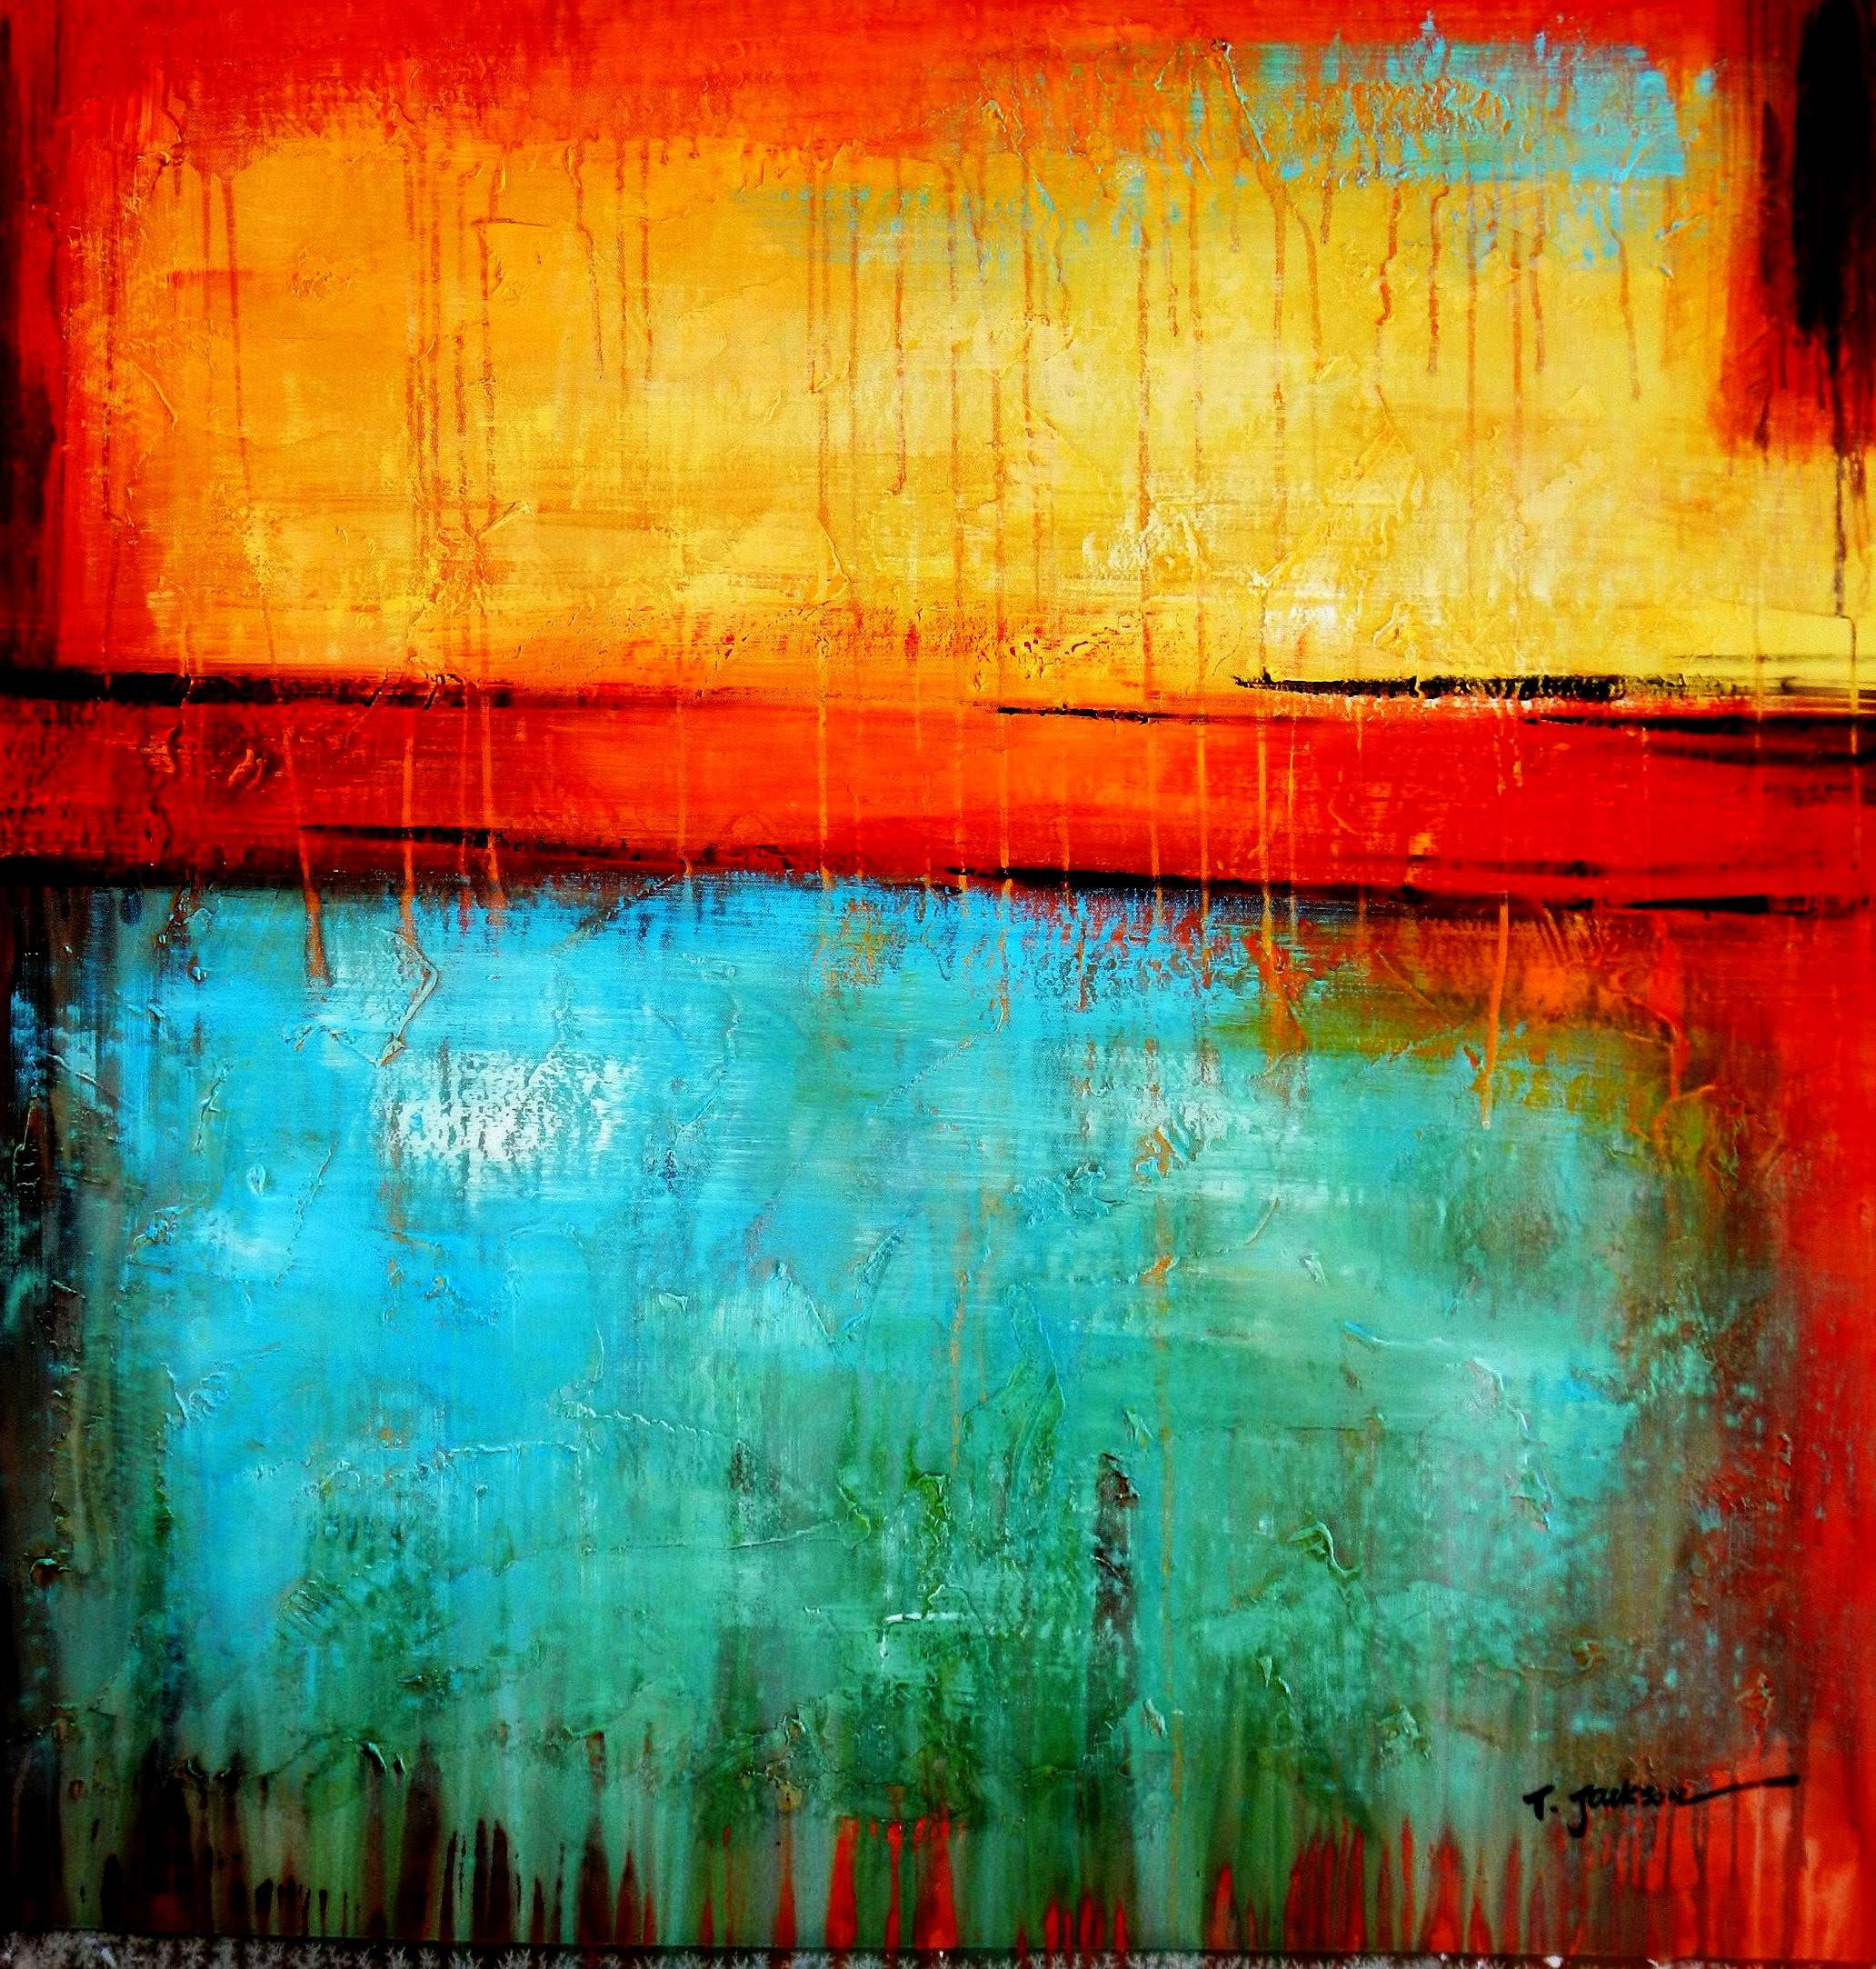 Abstract - Mirage in Babylon h96156 90x90cm abstraktes Ölbild